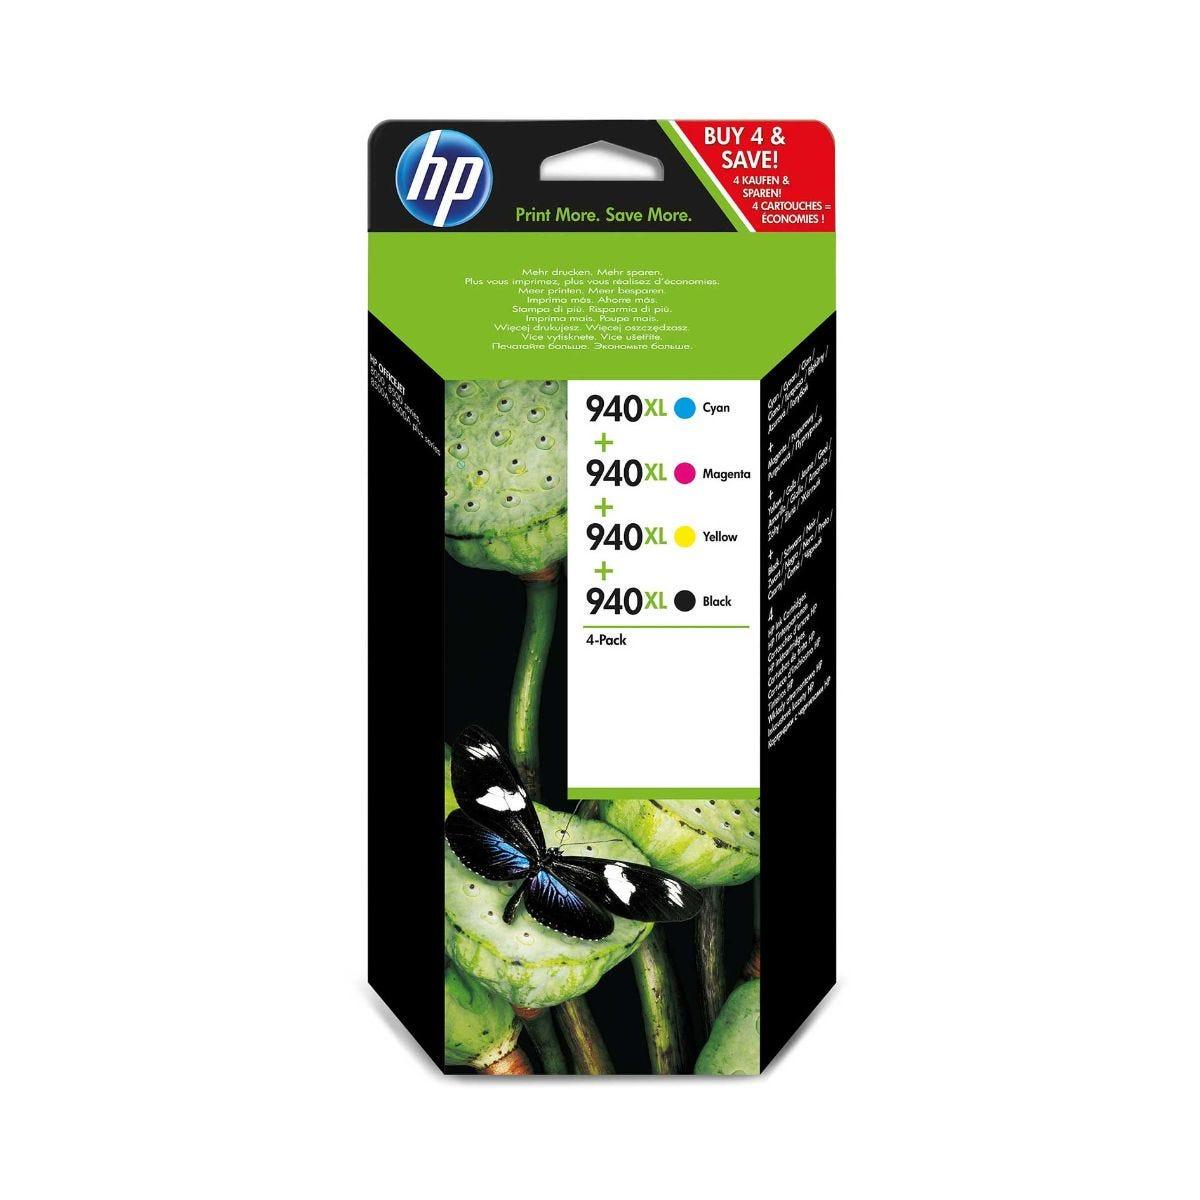 Image of HP 940XL Inkjet Cartridge Multi Pack, Multi